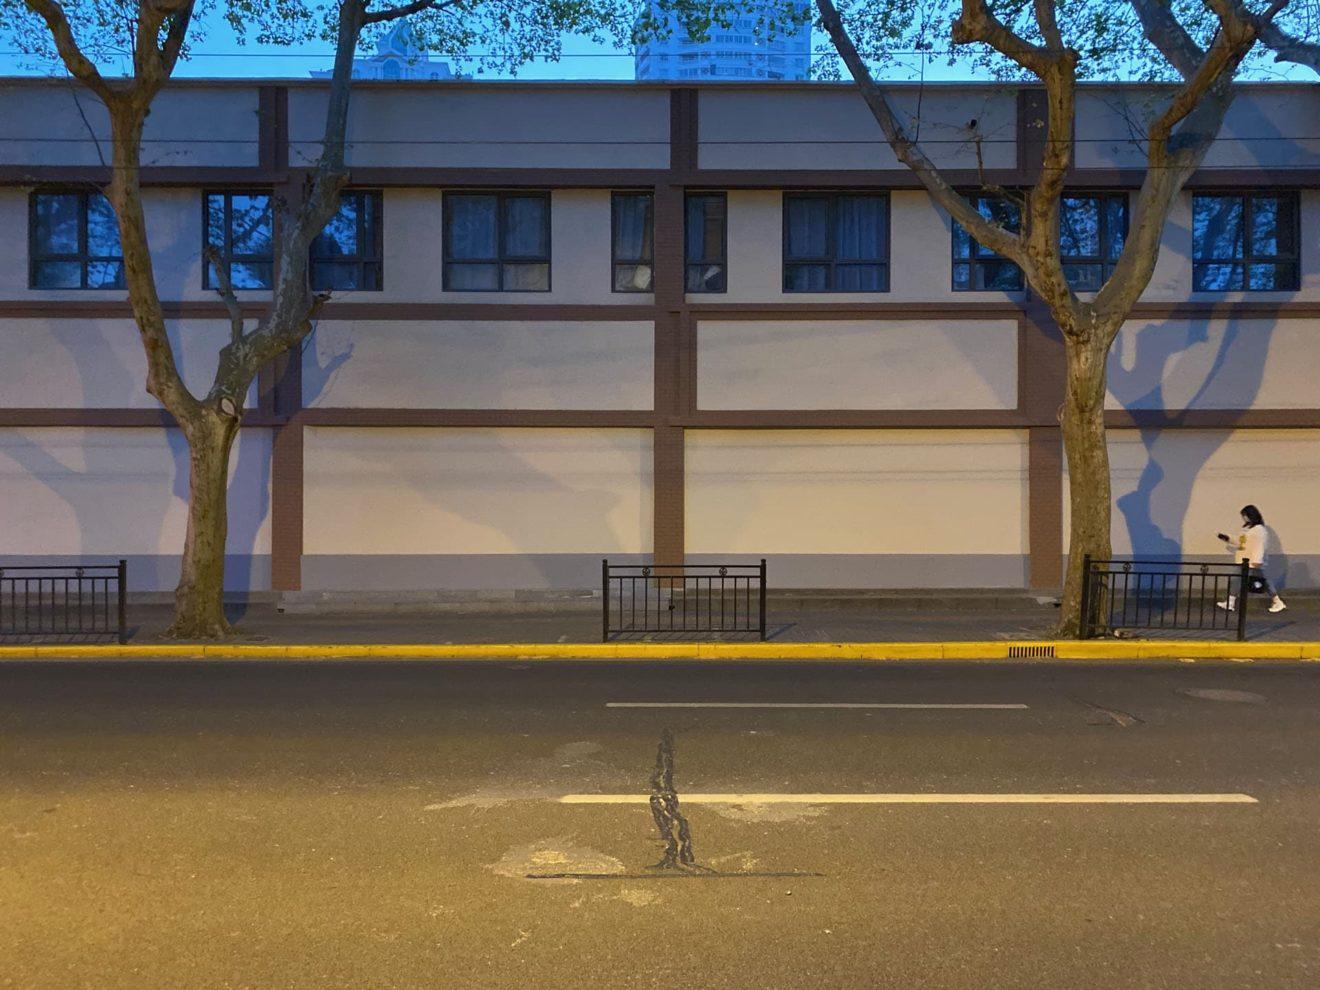 straatbeeld Shanghai zonder informele activiteiten